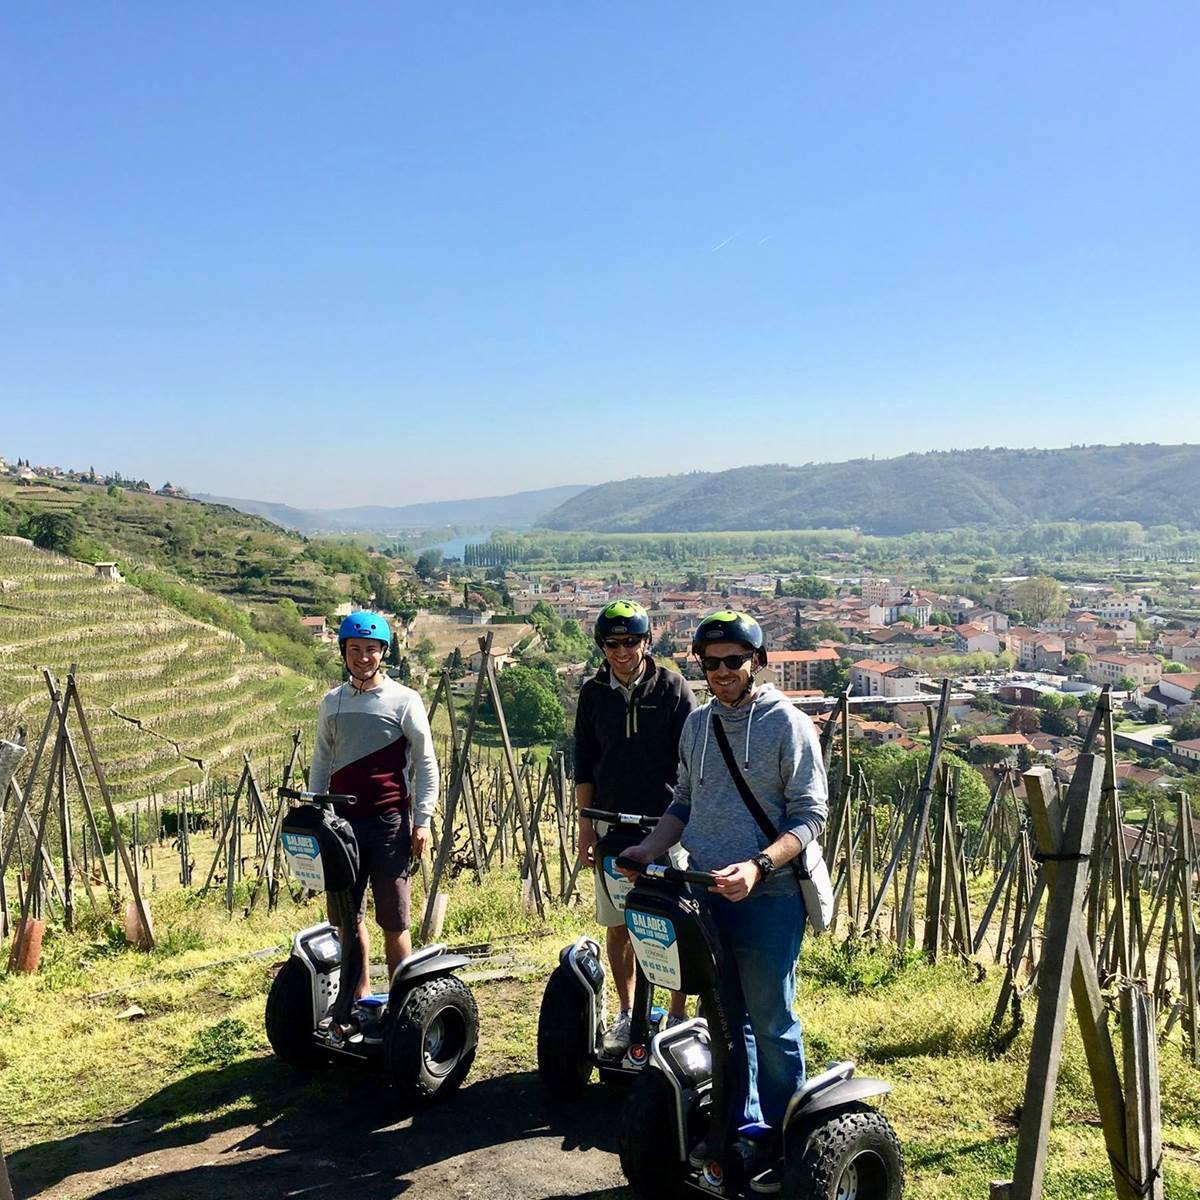 condrieu : découvrir les vignobles à Segway